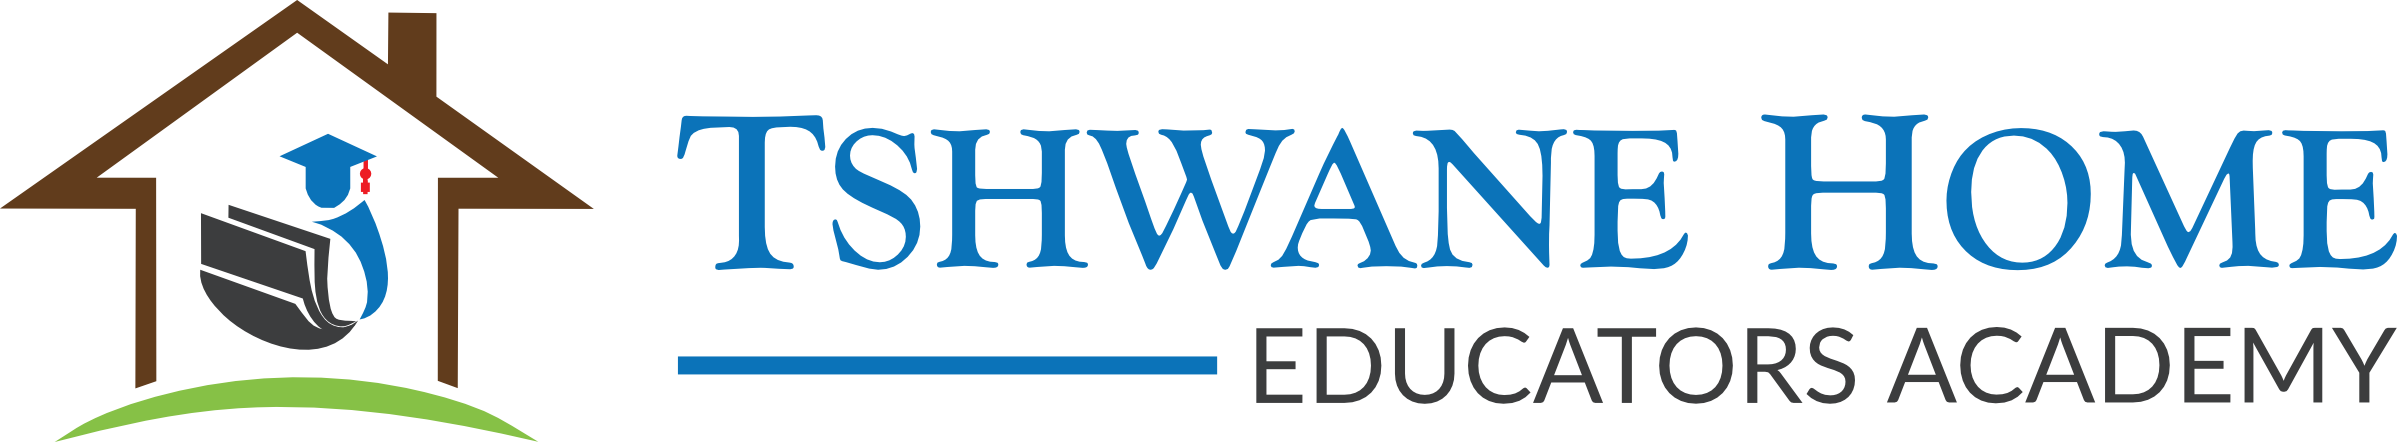 Tshwane Home Educators Academy